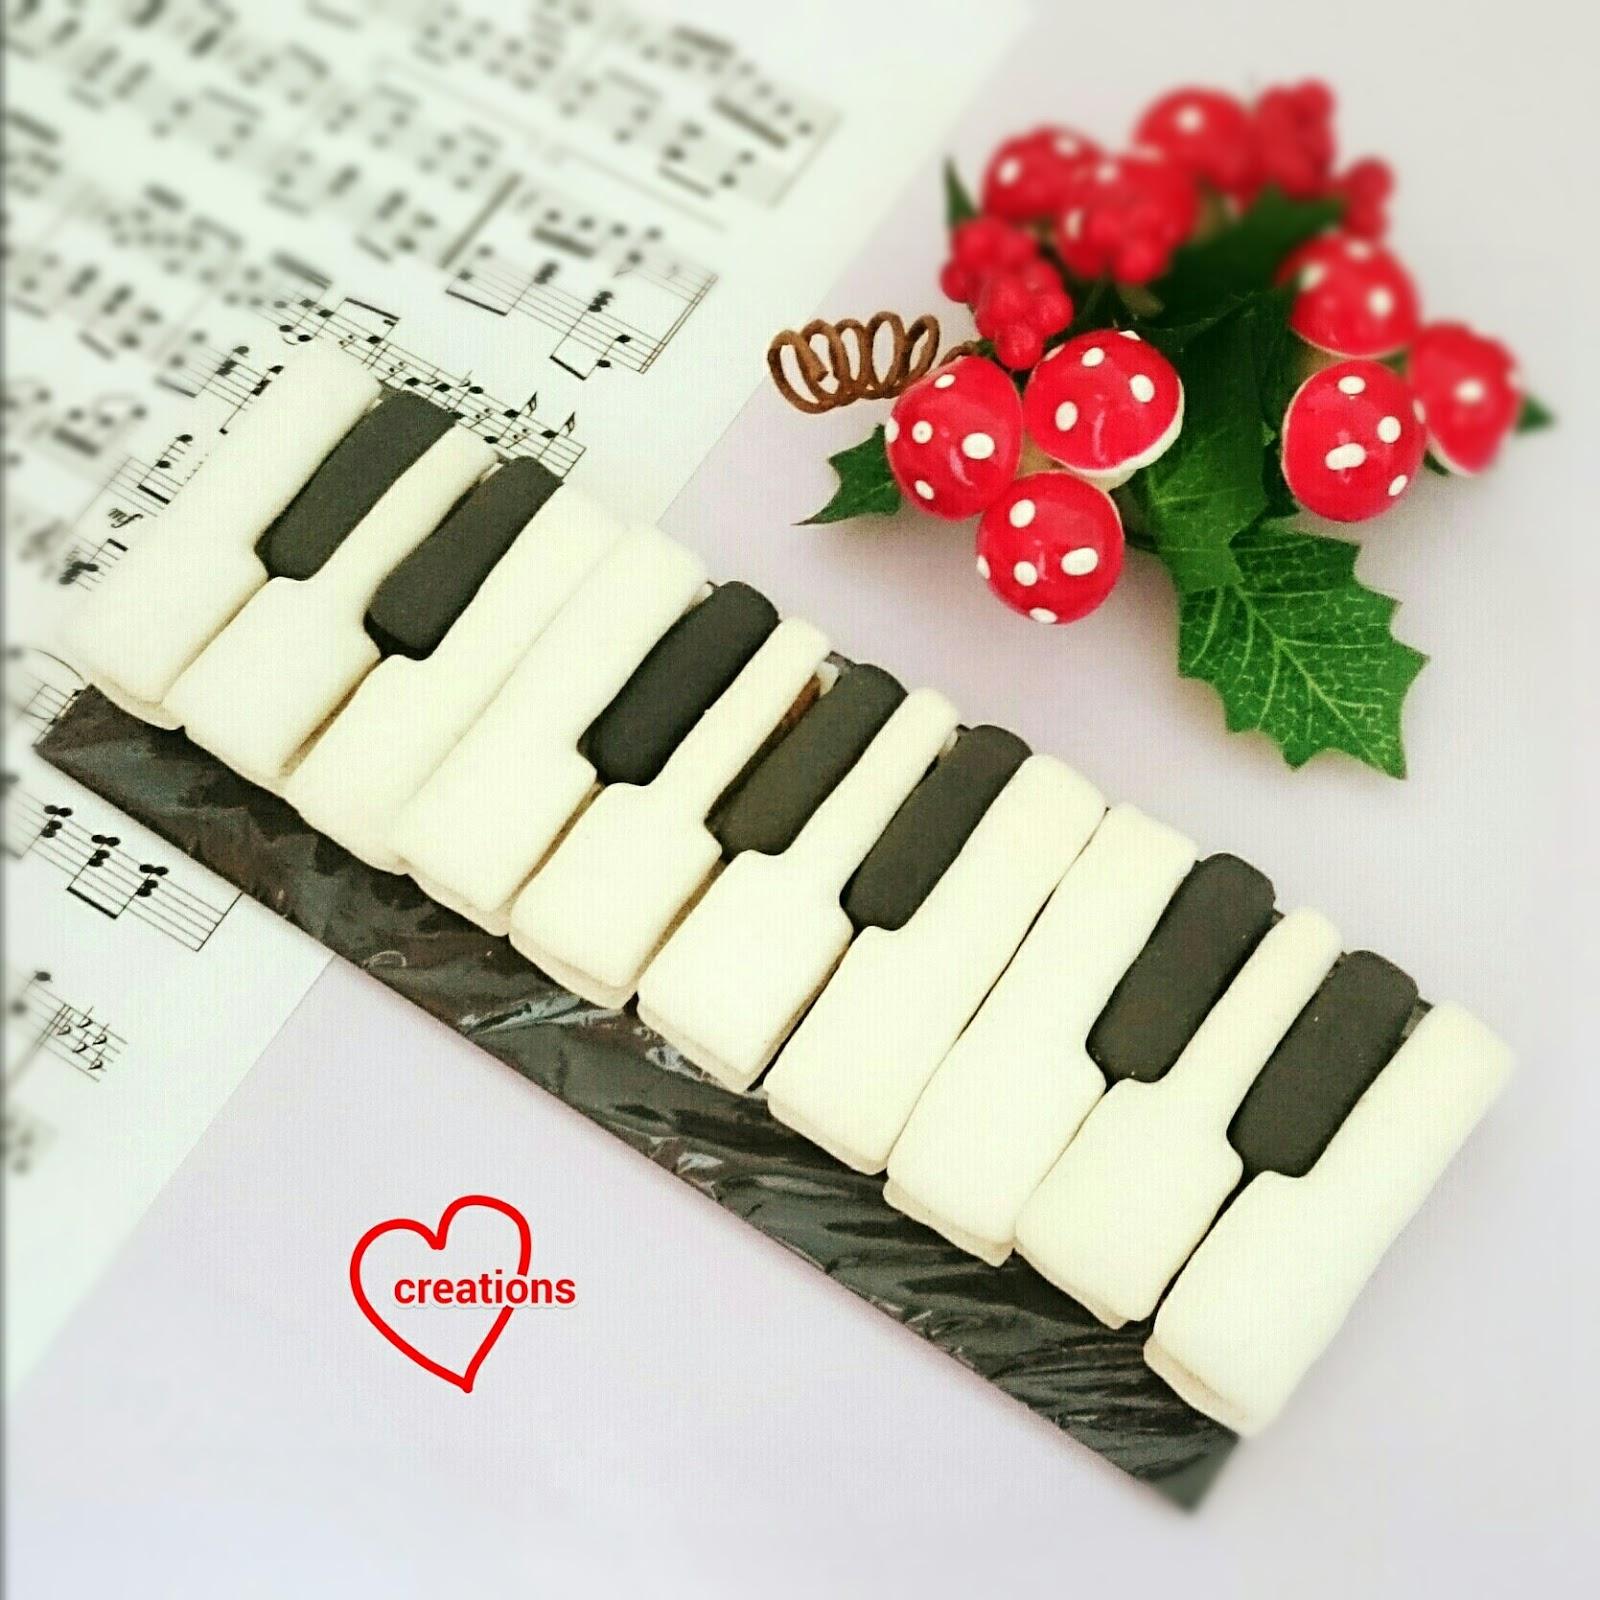 Piano Keyboard Macarons Template Provided